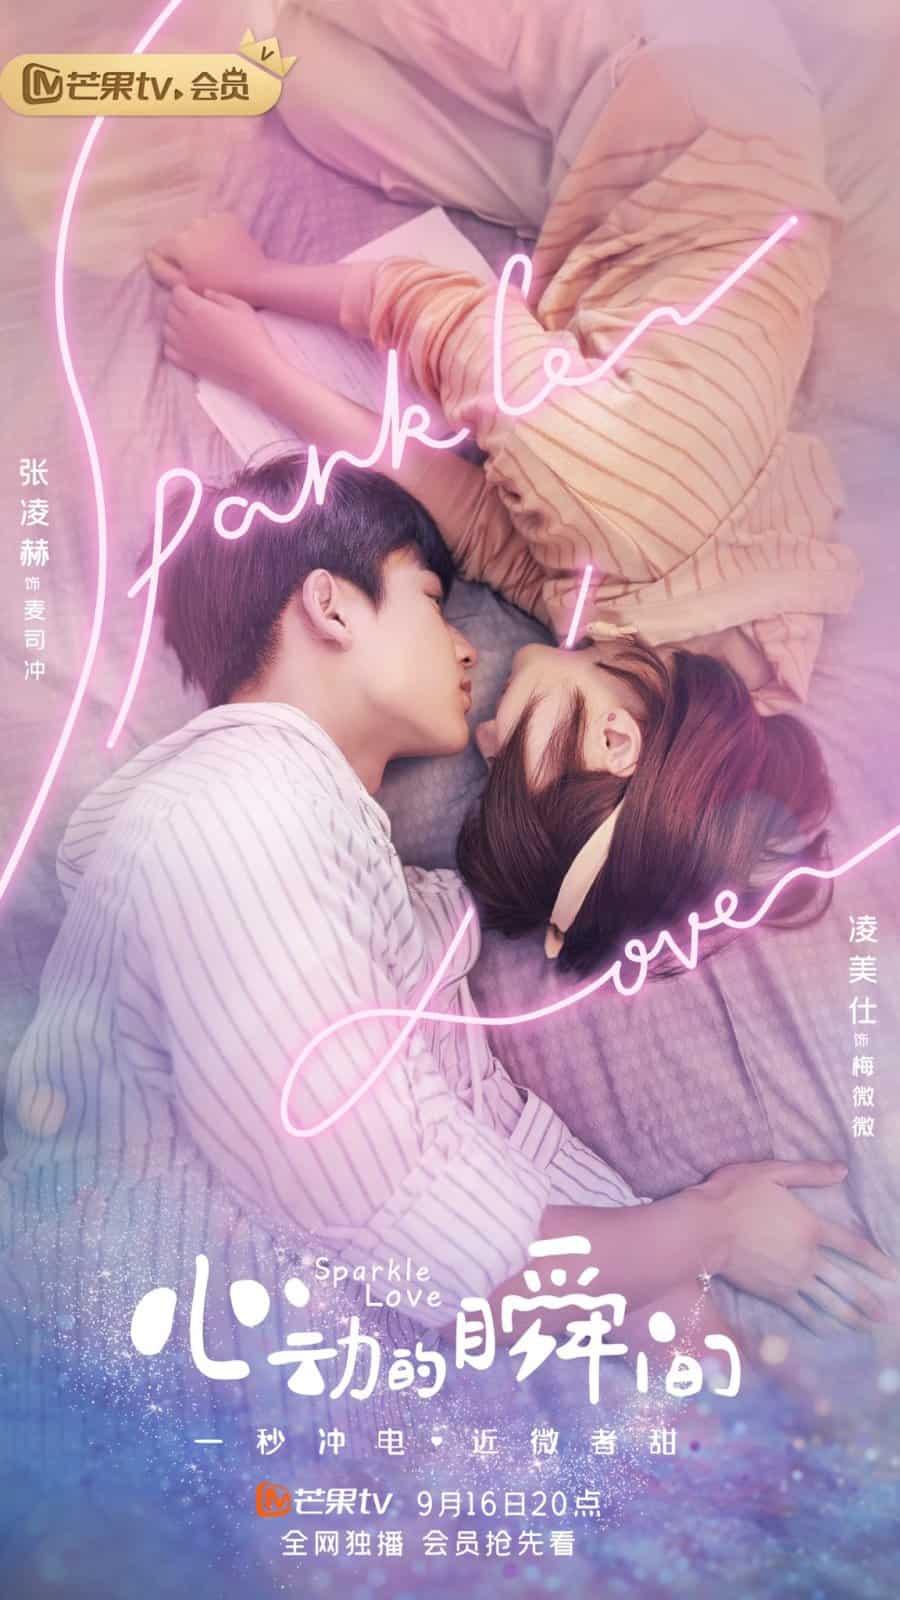 Sparkle Love (2020) จังหวะหัวใจสปาร์ครัก ซับไทย EP1 – EP24